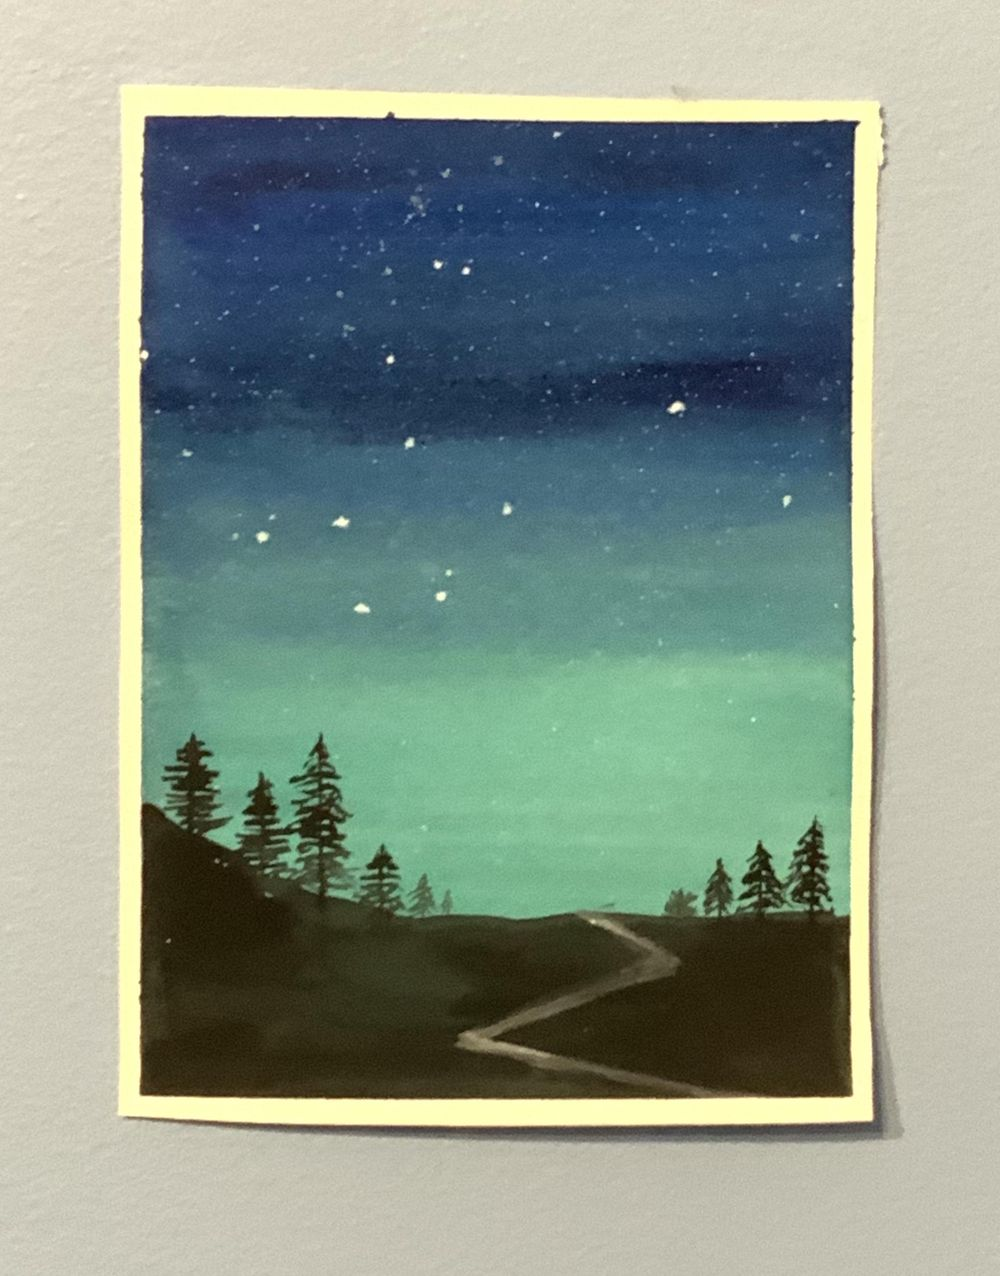 5 beautiful night skies - image 2 - student project